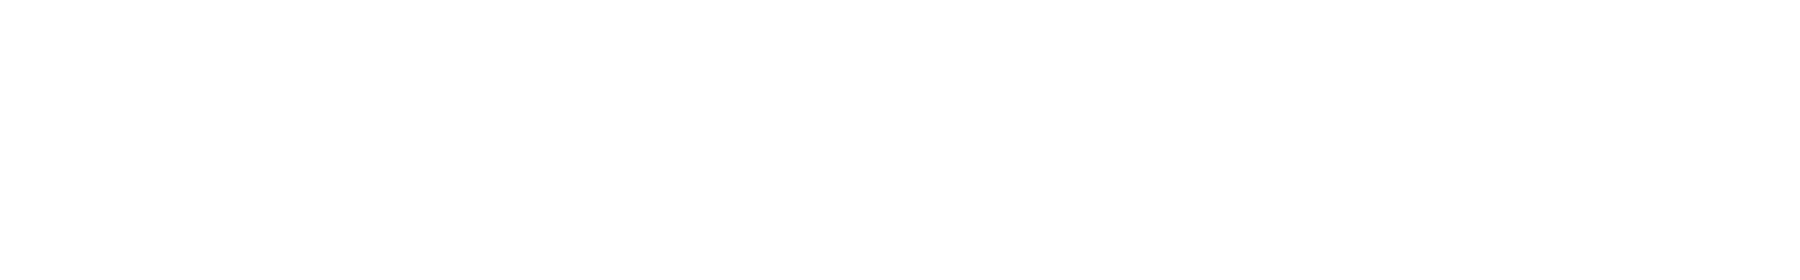 shs ch musicloop 125 piano2 cm